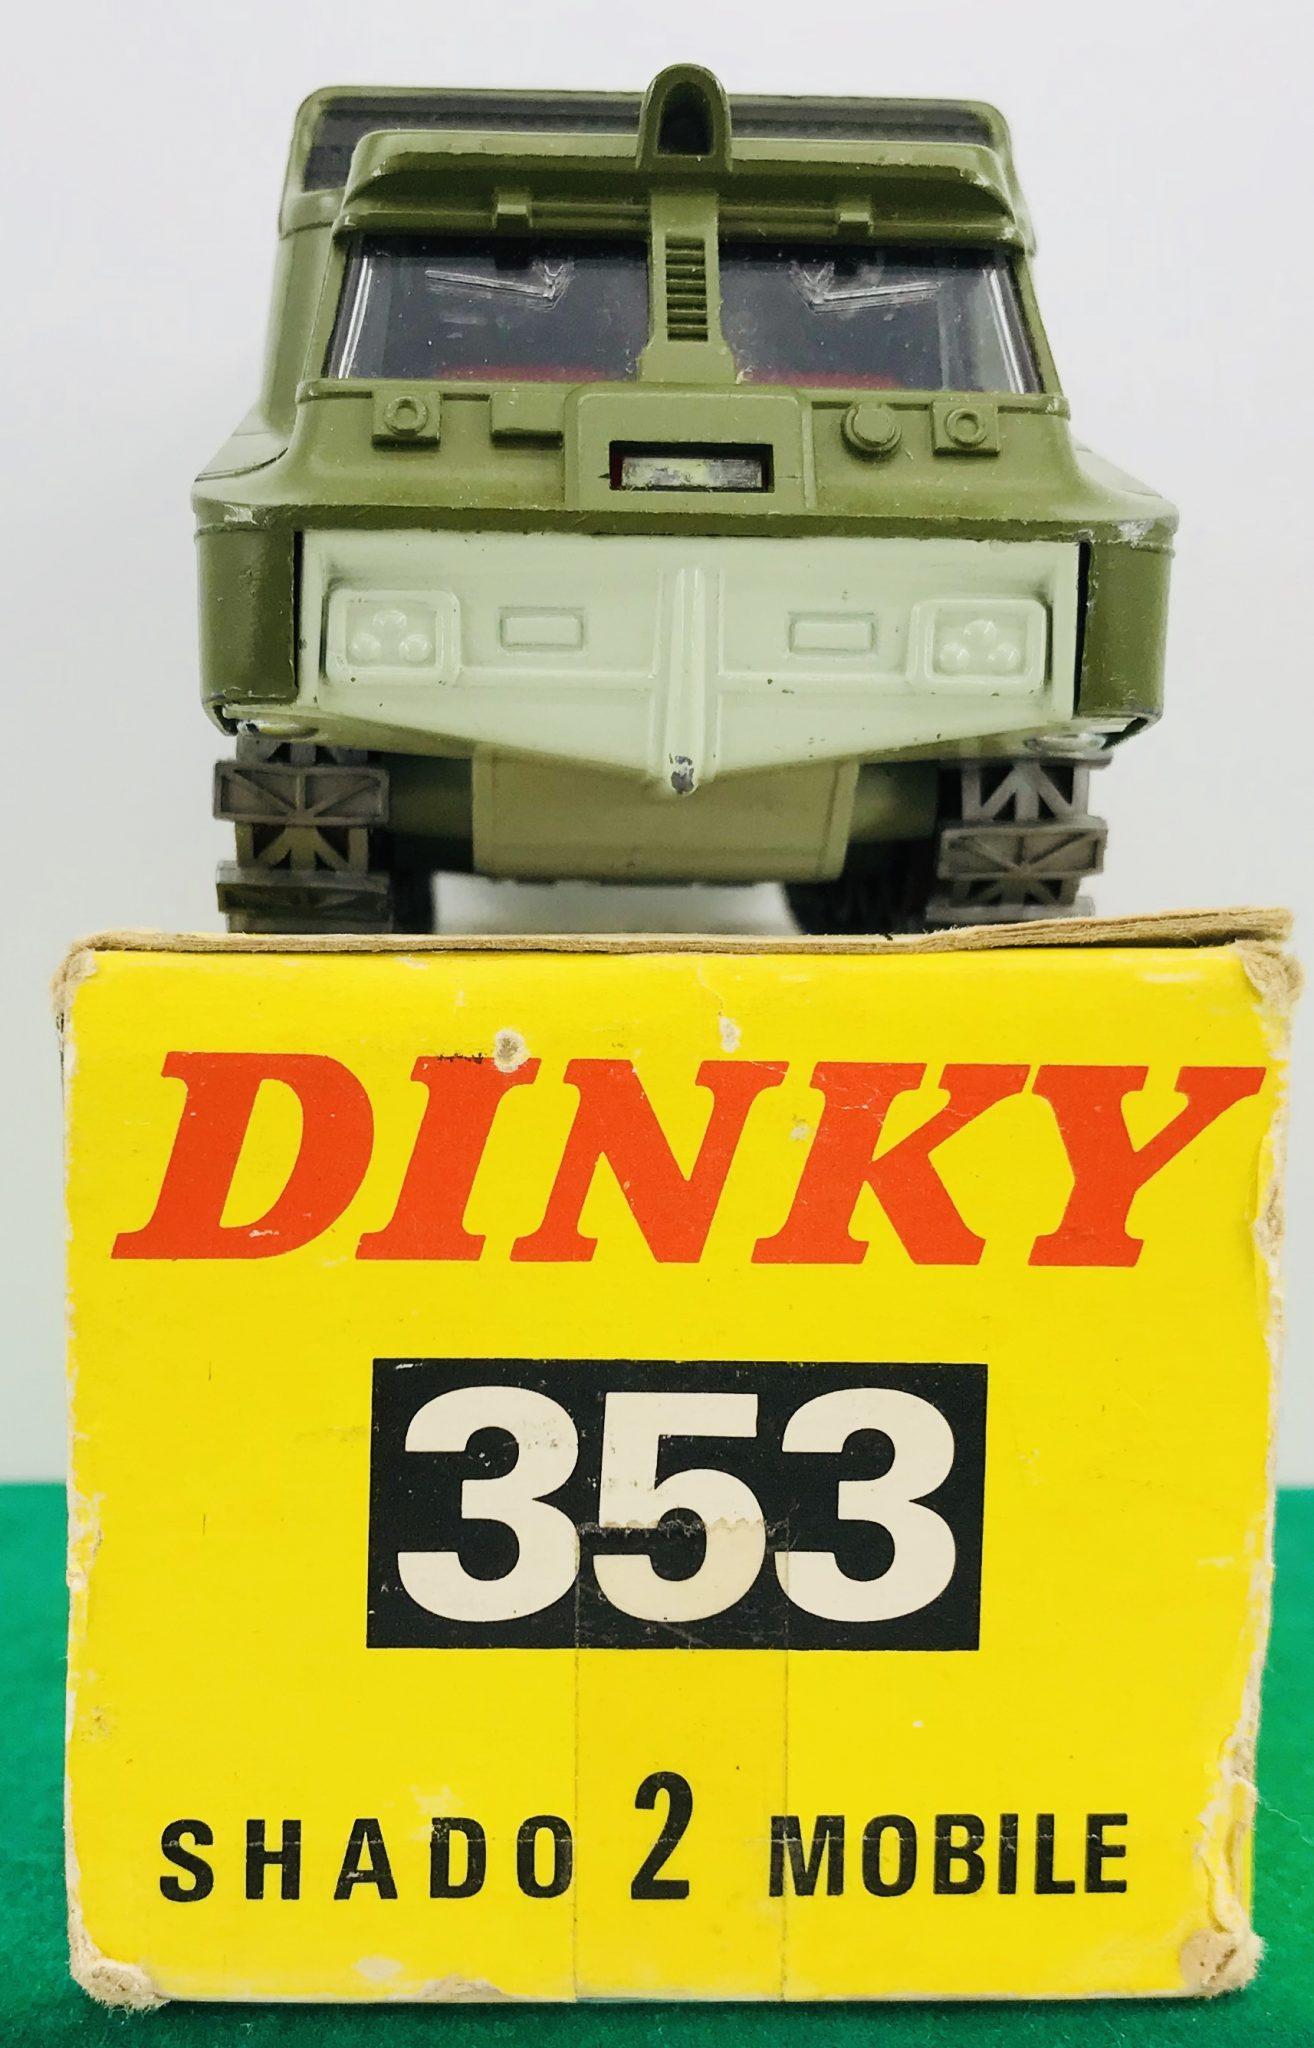 Dinky 353 U F O Shado 2 Mobile Toy Hunter Uk Retro Amp Vintage Toys